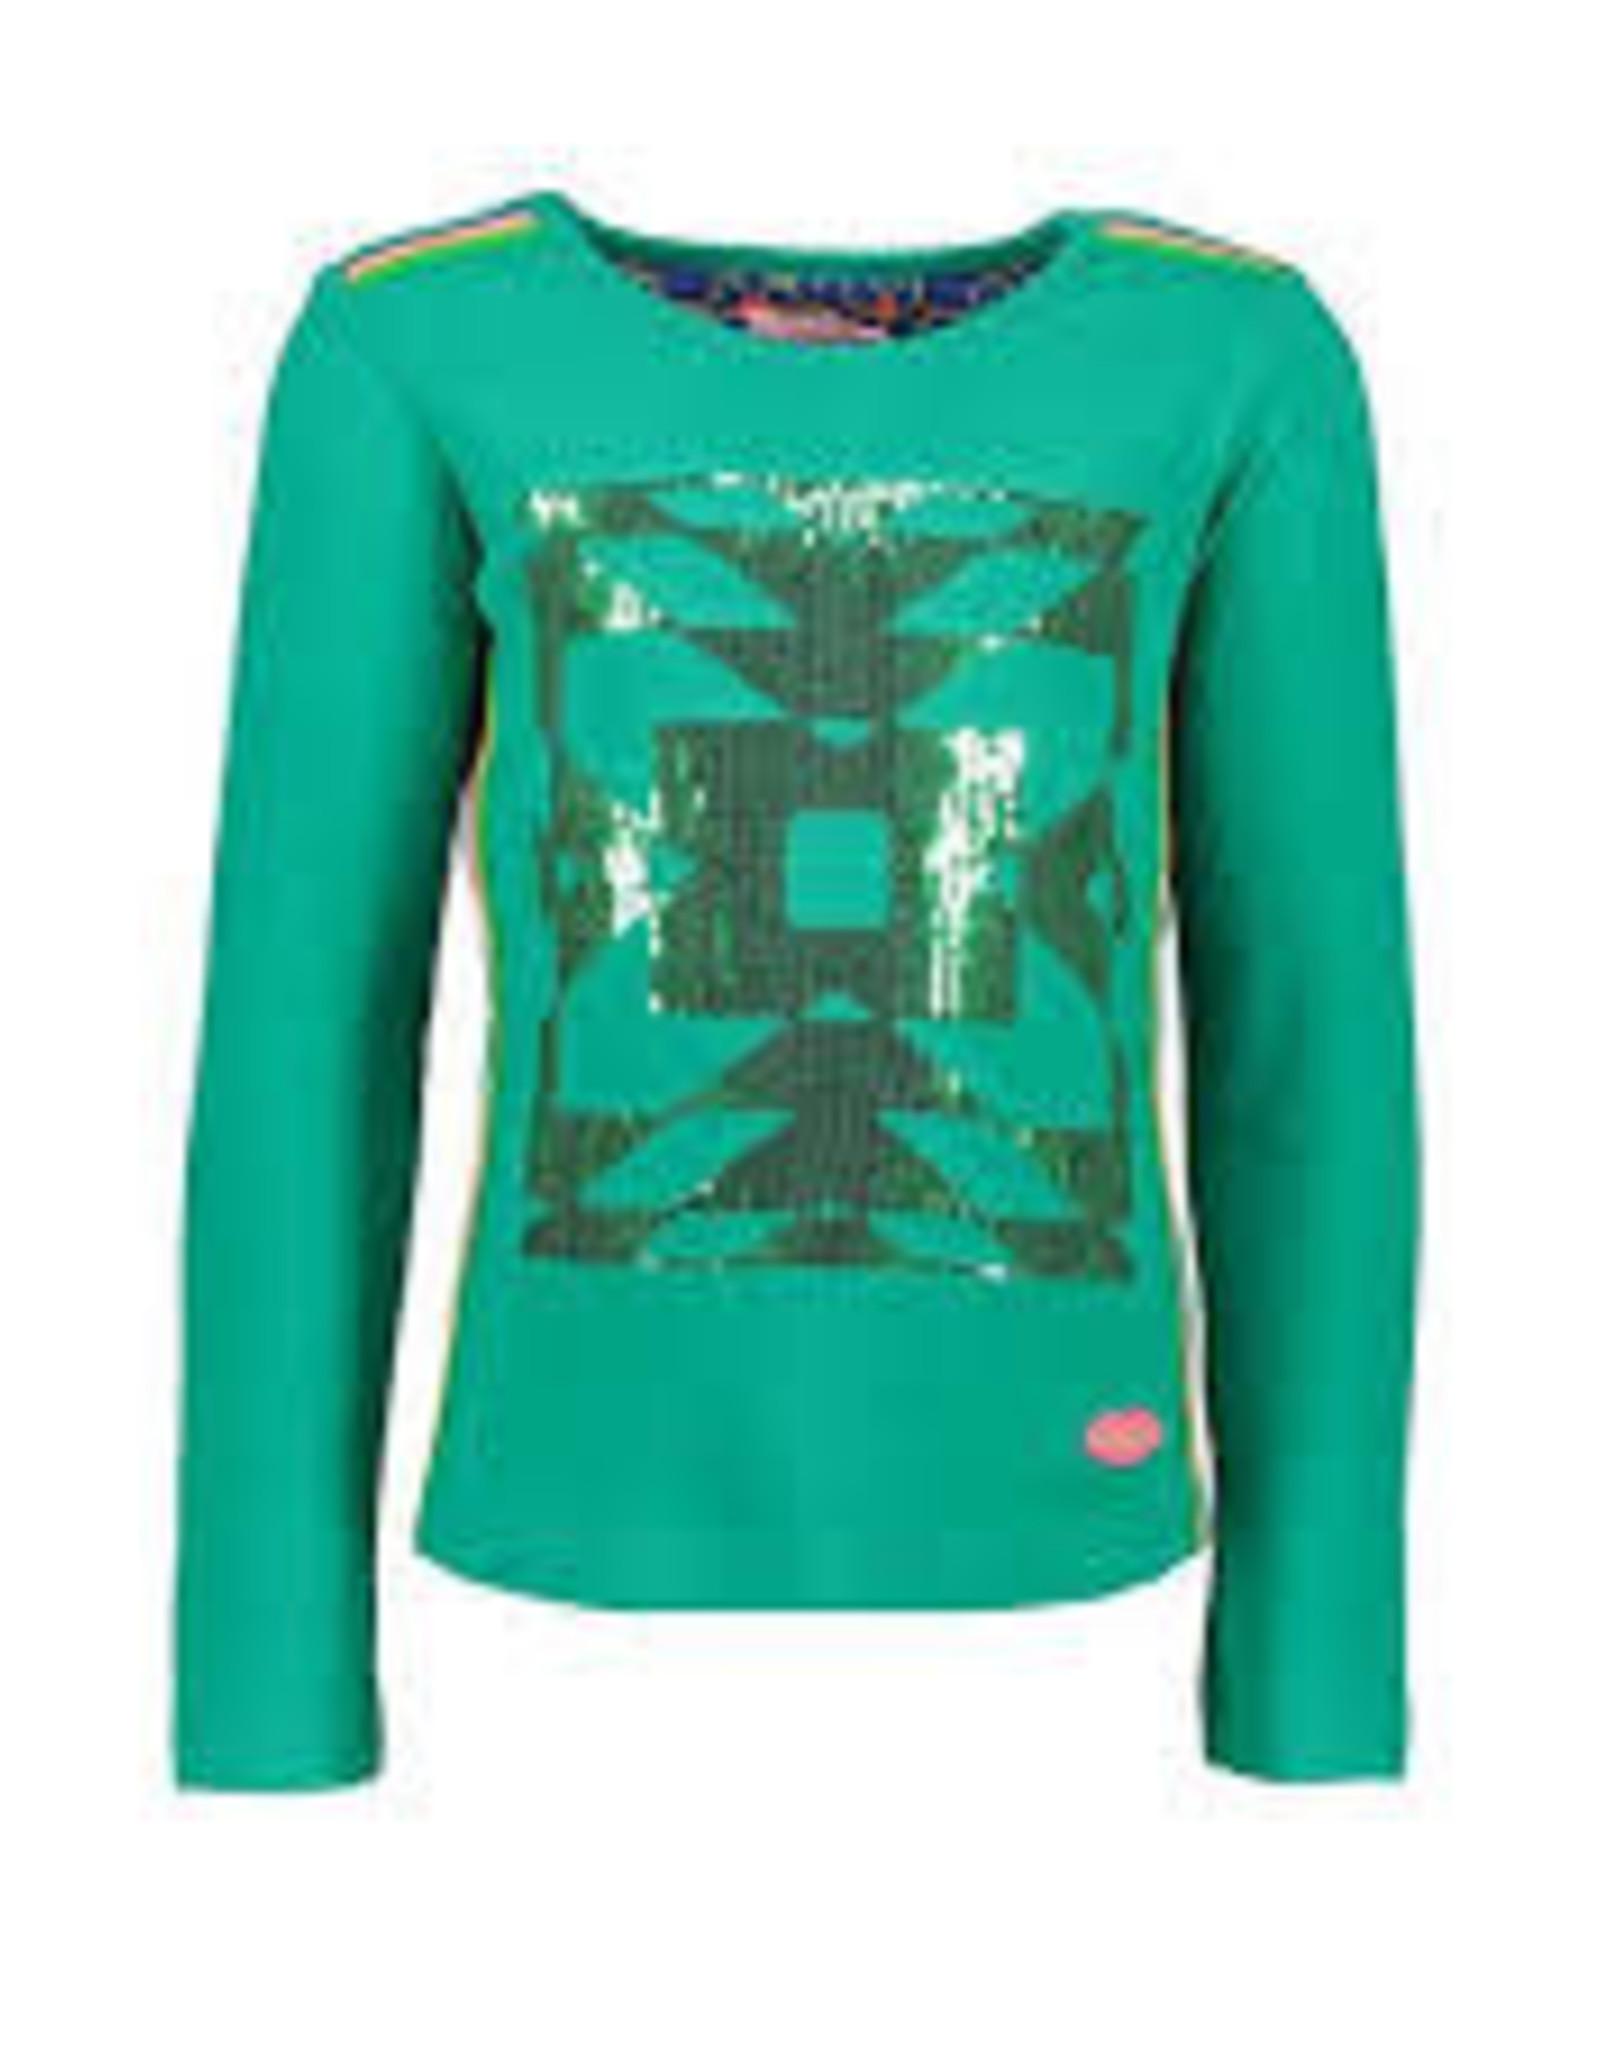 Kidz Art Girls T-shirt l/s sequins + fancy tapes